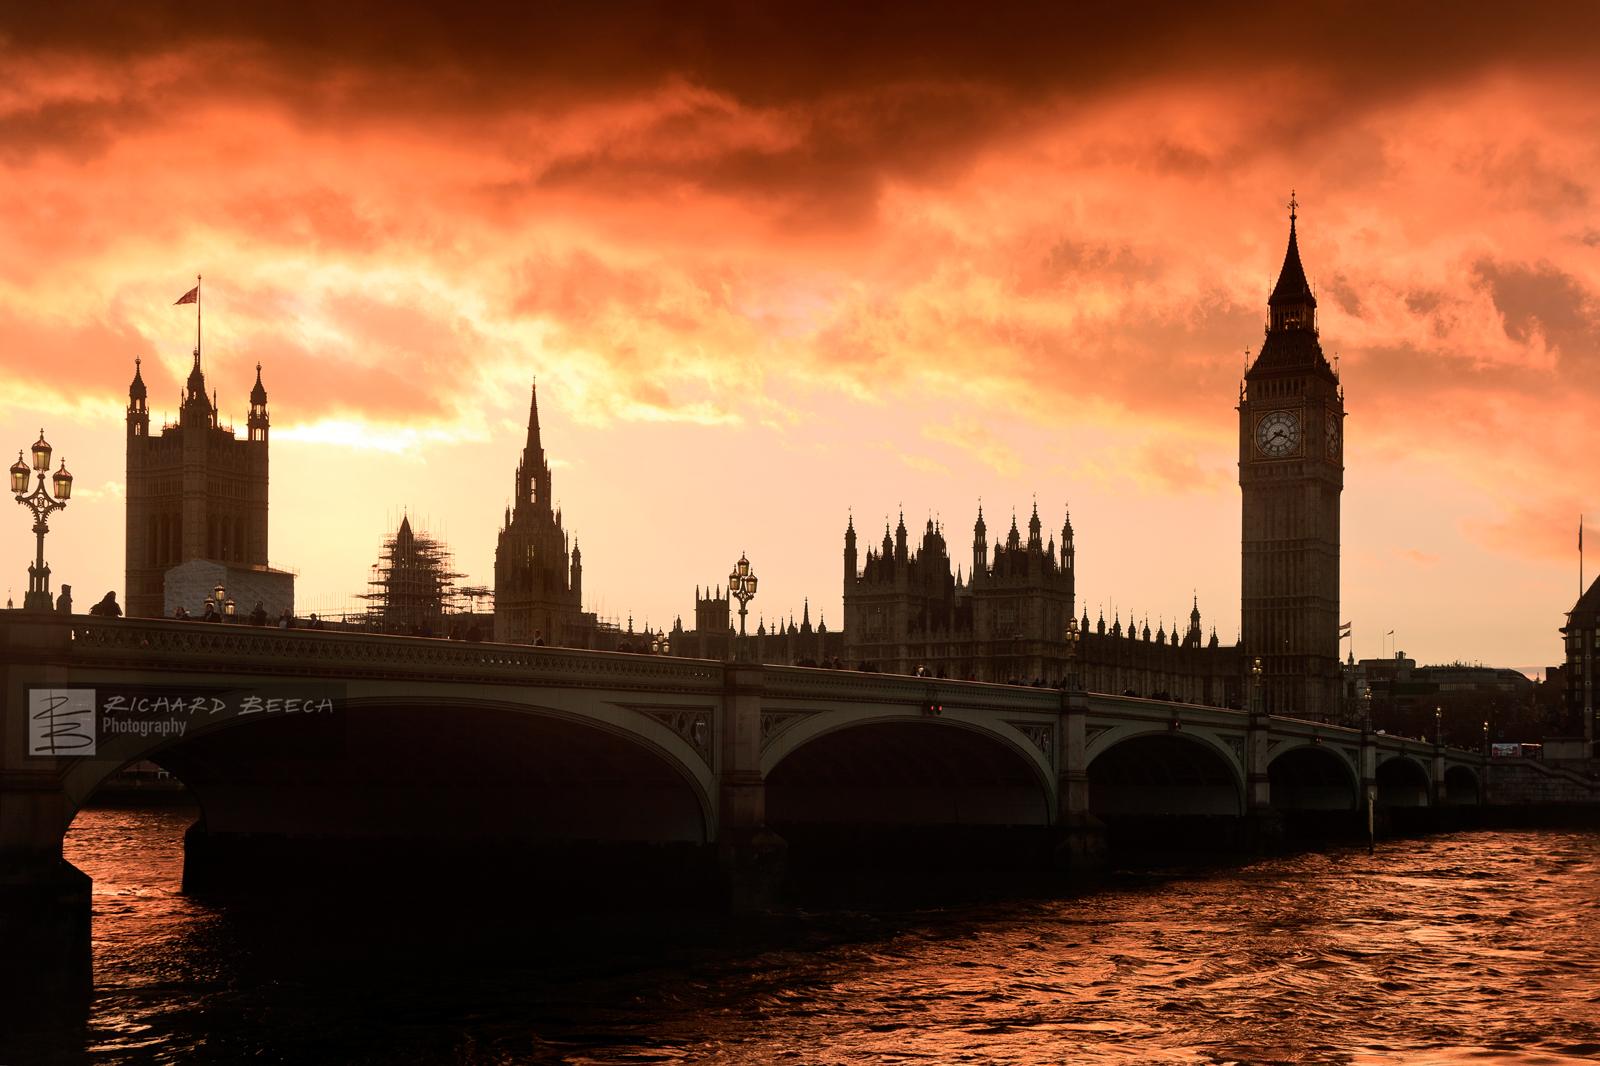 Fiery Sunset over Parliament